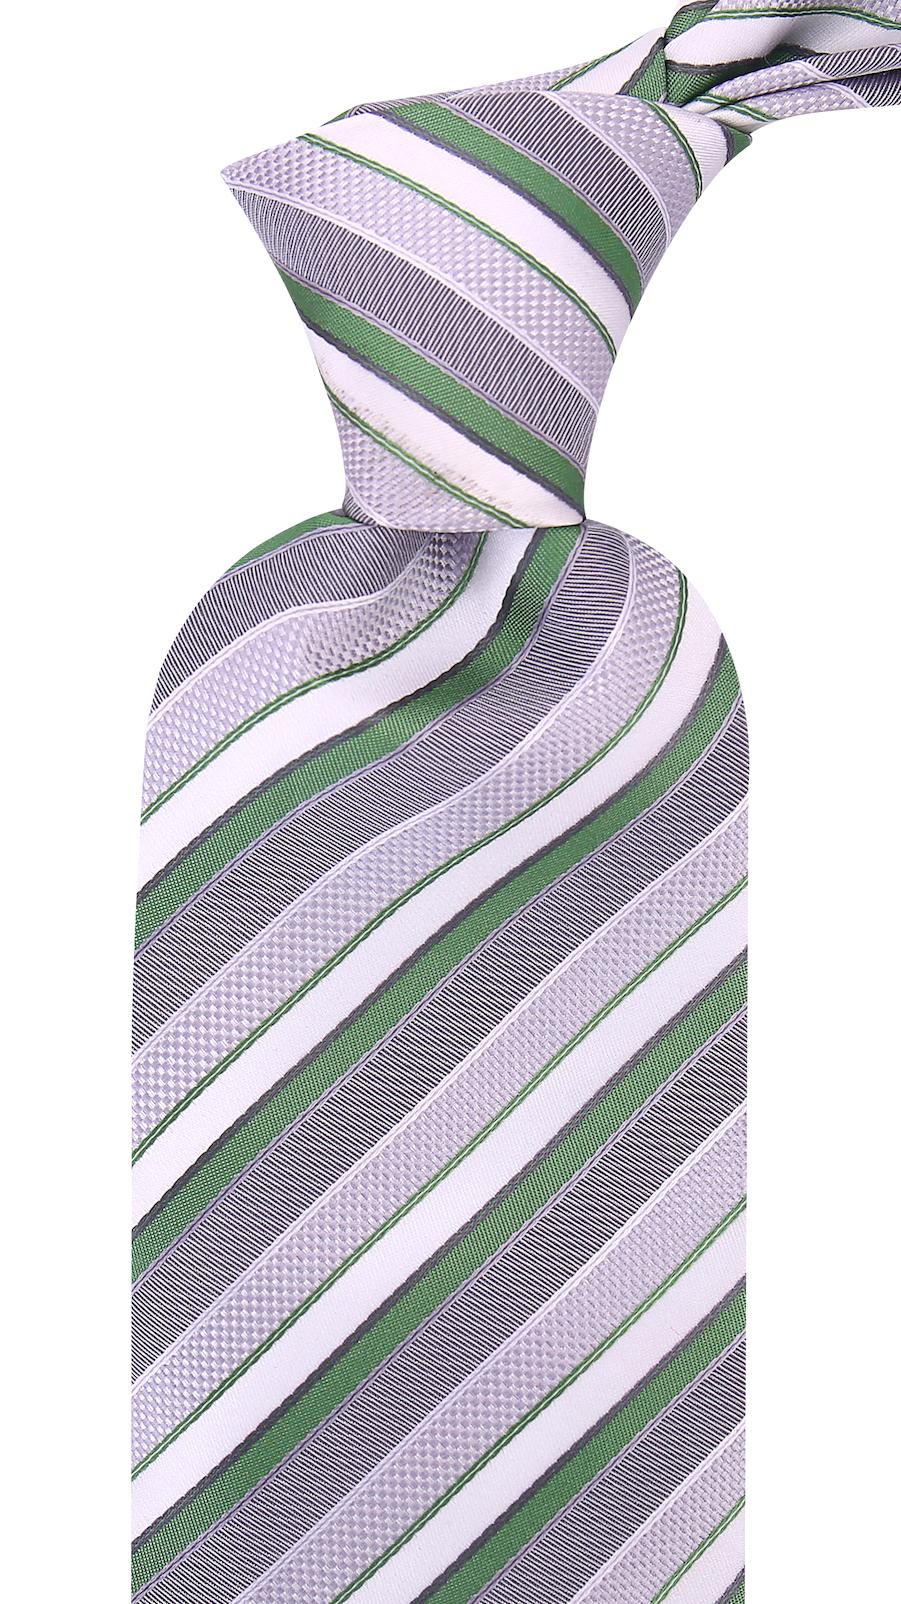 Scott-Allan-Striped-Necktie-Mens-Ties-in-Various-Colors thumbnail 14